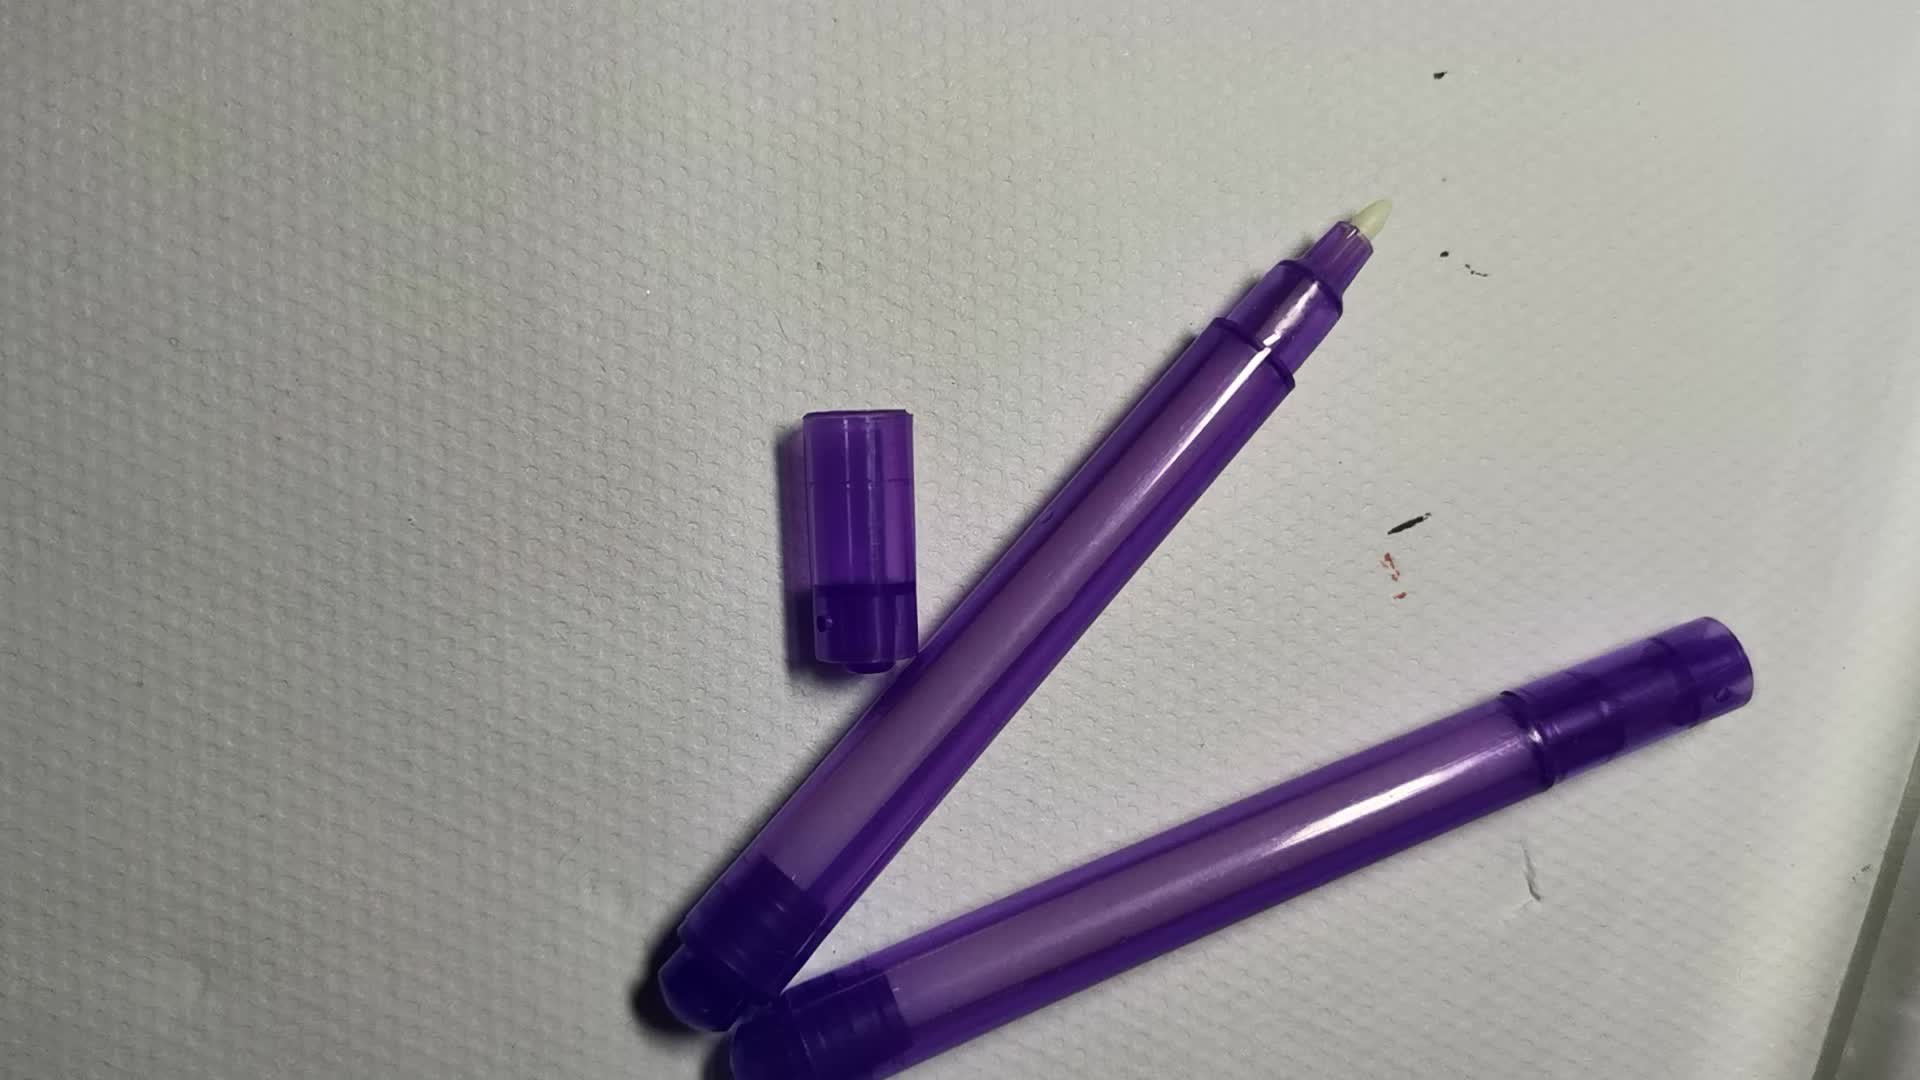 Cixi Factory MQ-800 Cheap LED Light Ball Pen Multi-Functional Plastic Led Torch Ball Pen,Led Flashlight Ballpoint Pen